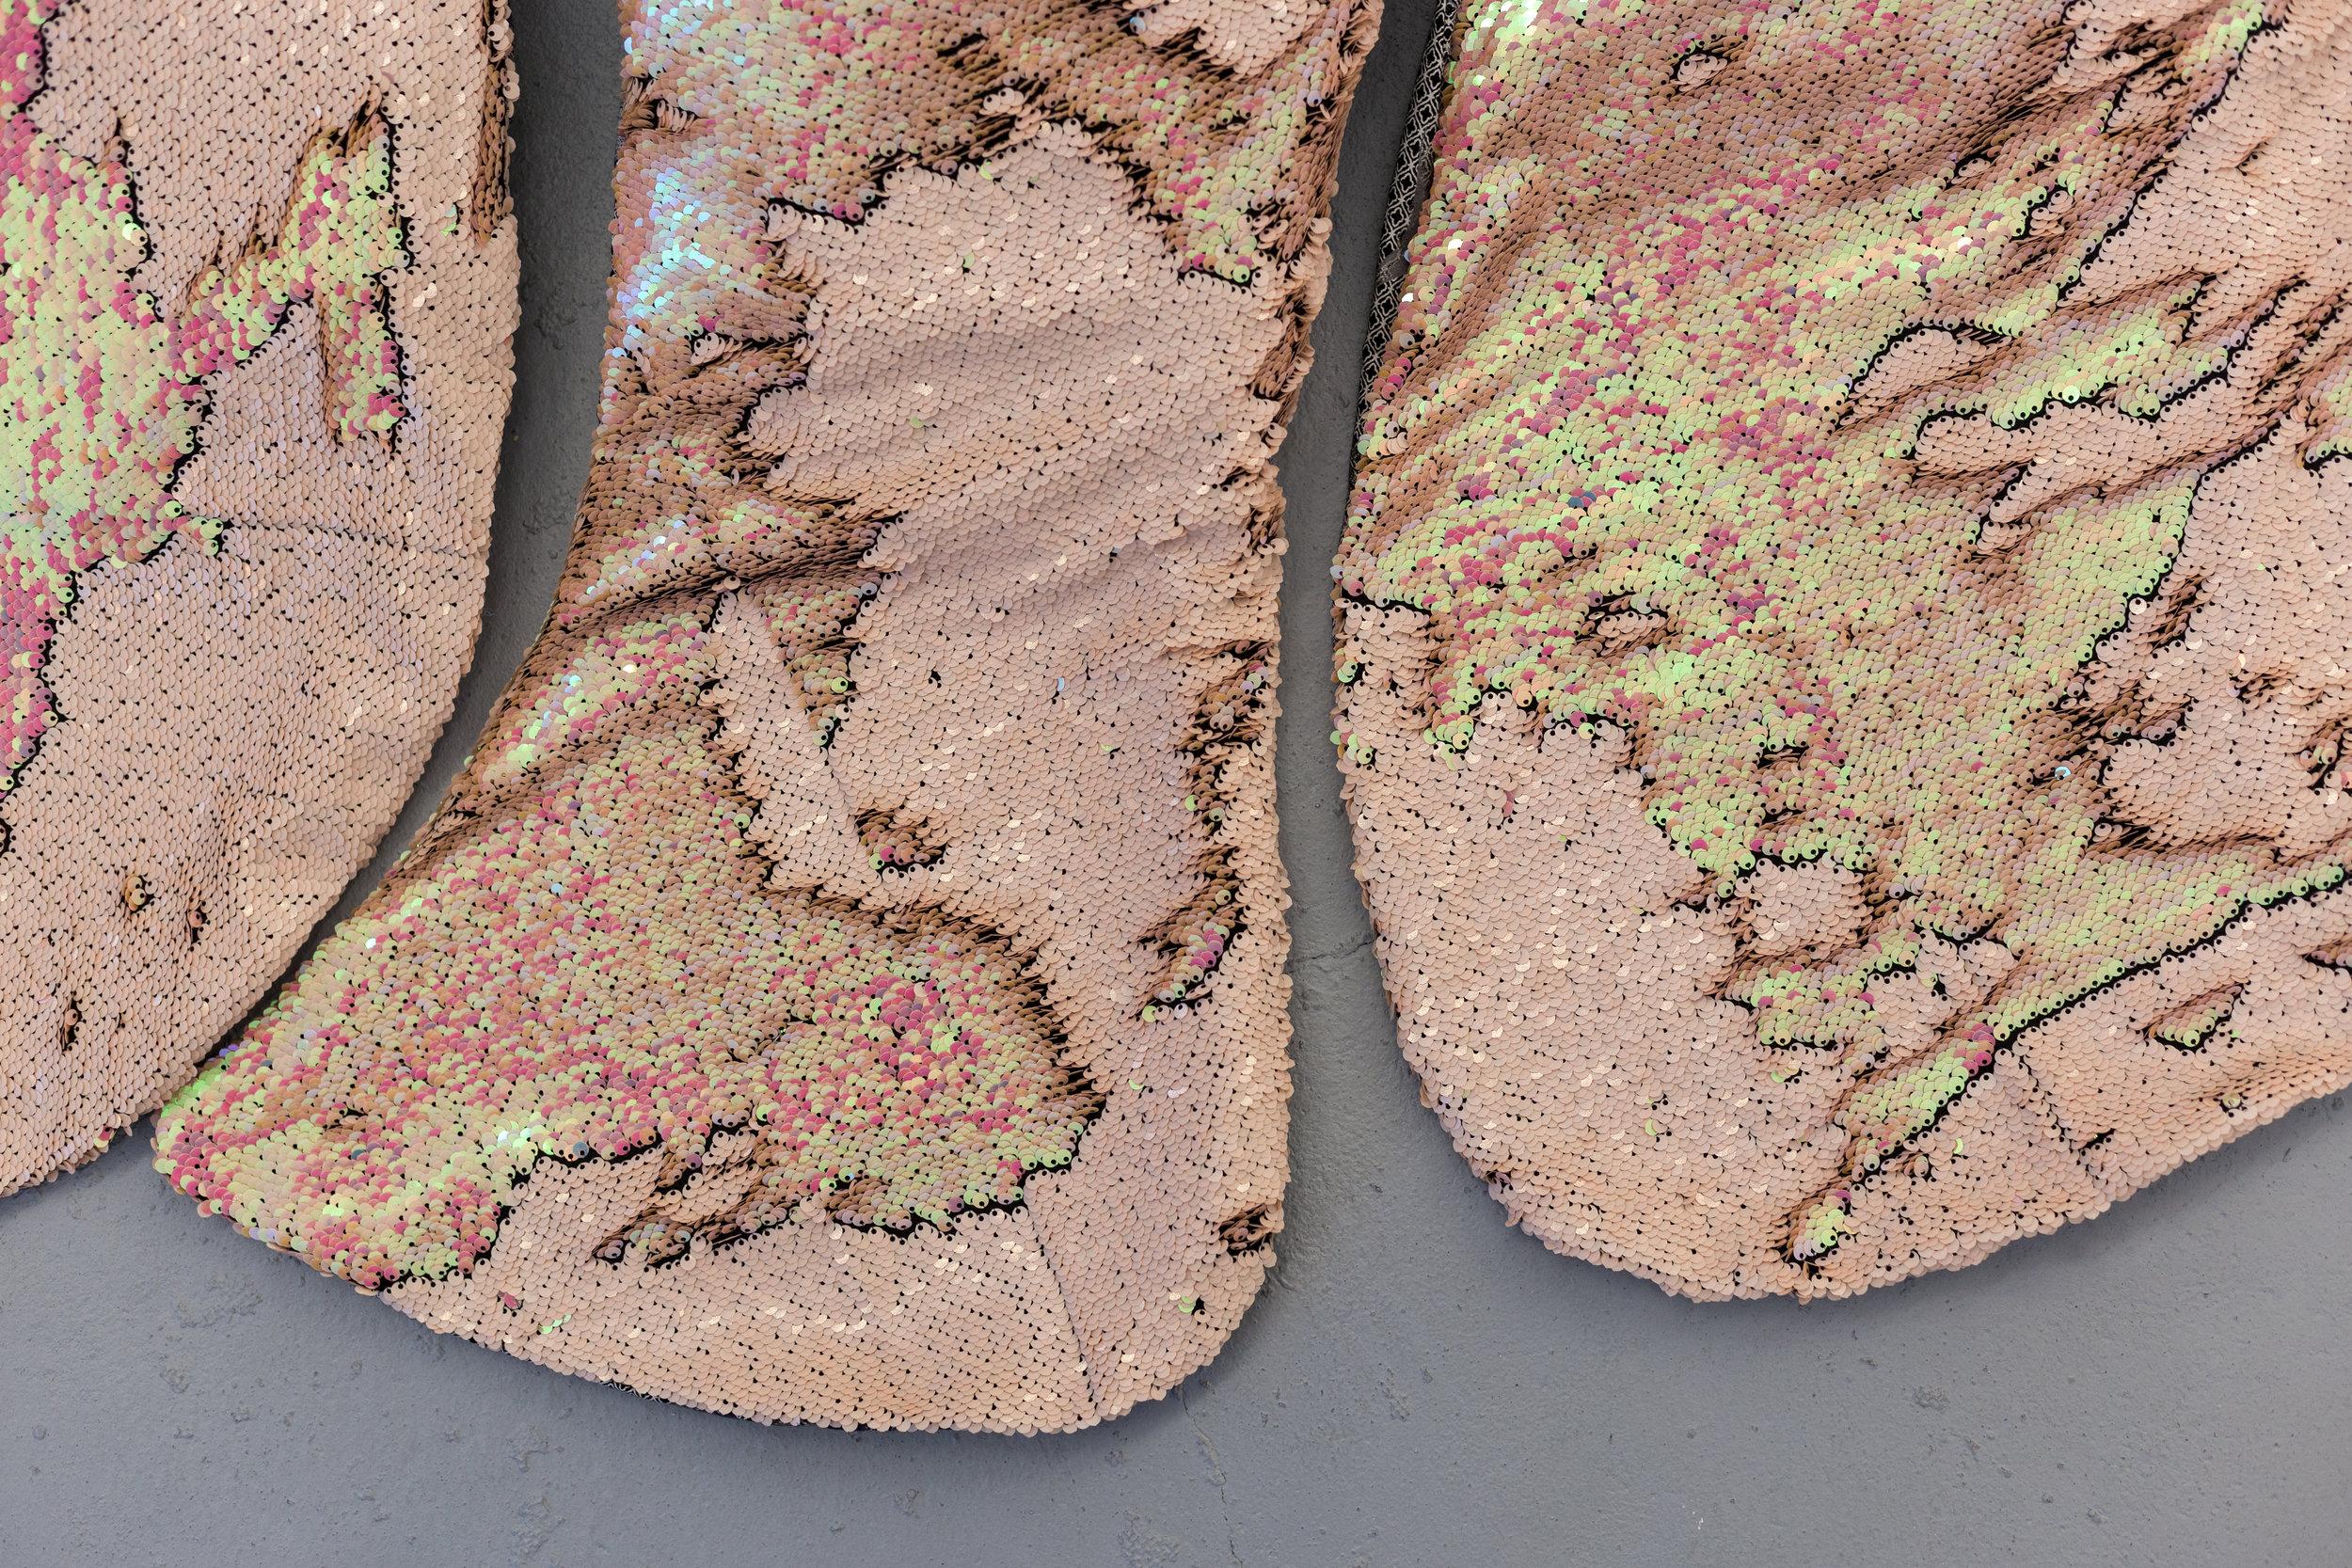 Donatella Bernardi,  Carpet Pond  (detail), 2017, digital printed fabric, shaped canvas, 175 x 175 cm  Photo: Kilian Bannwart